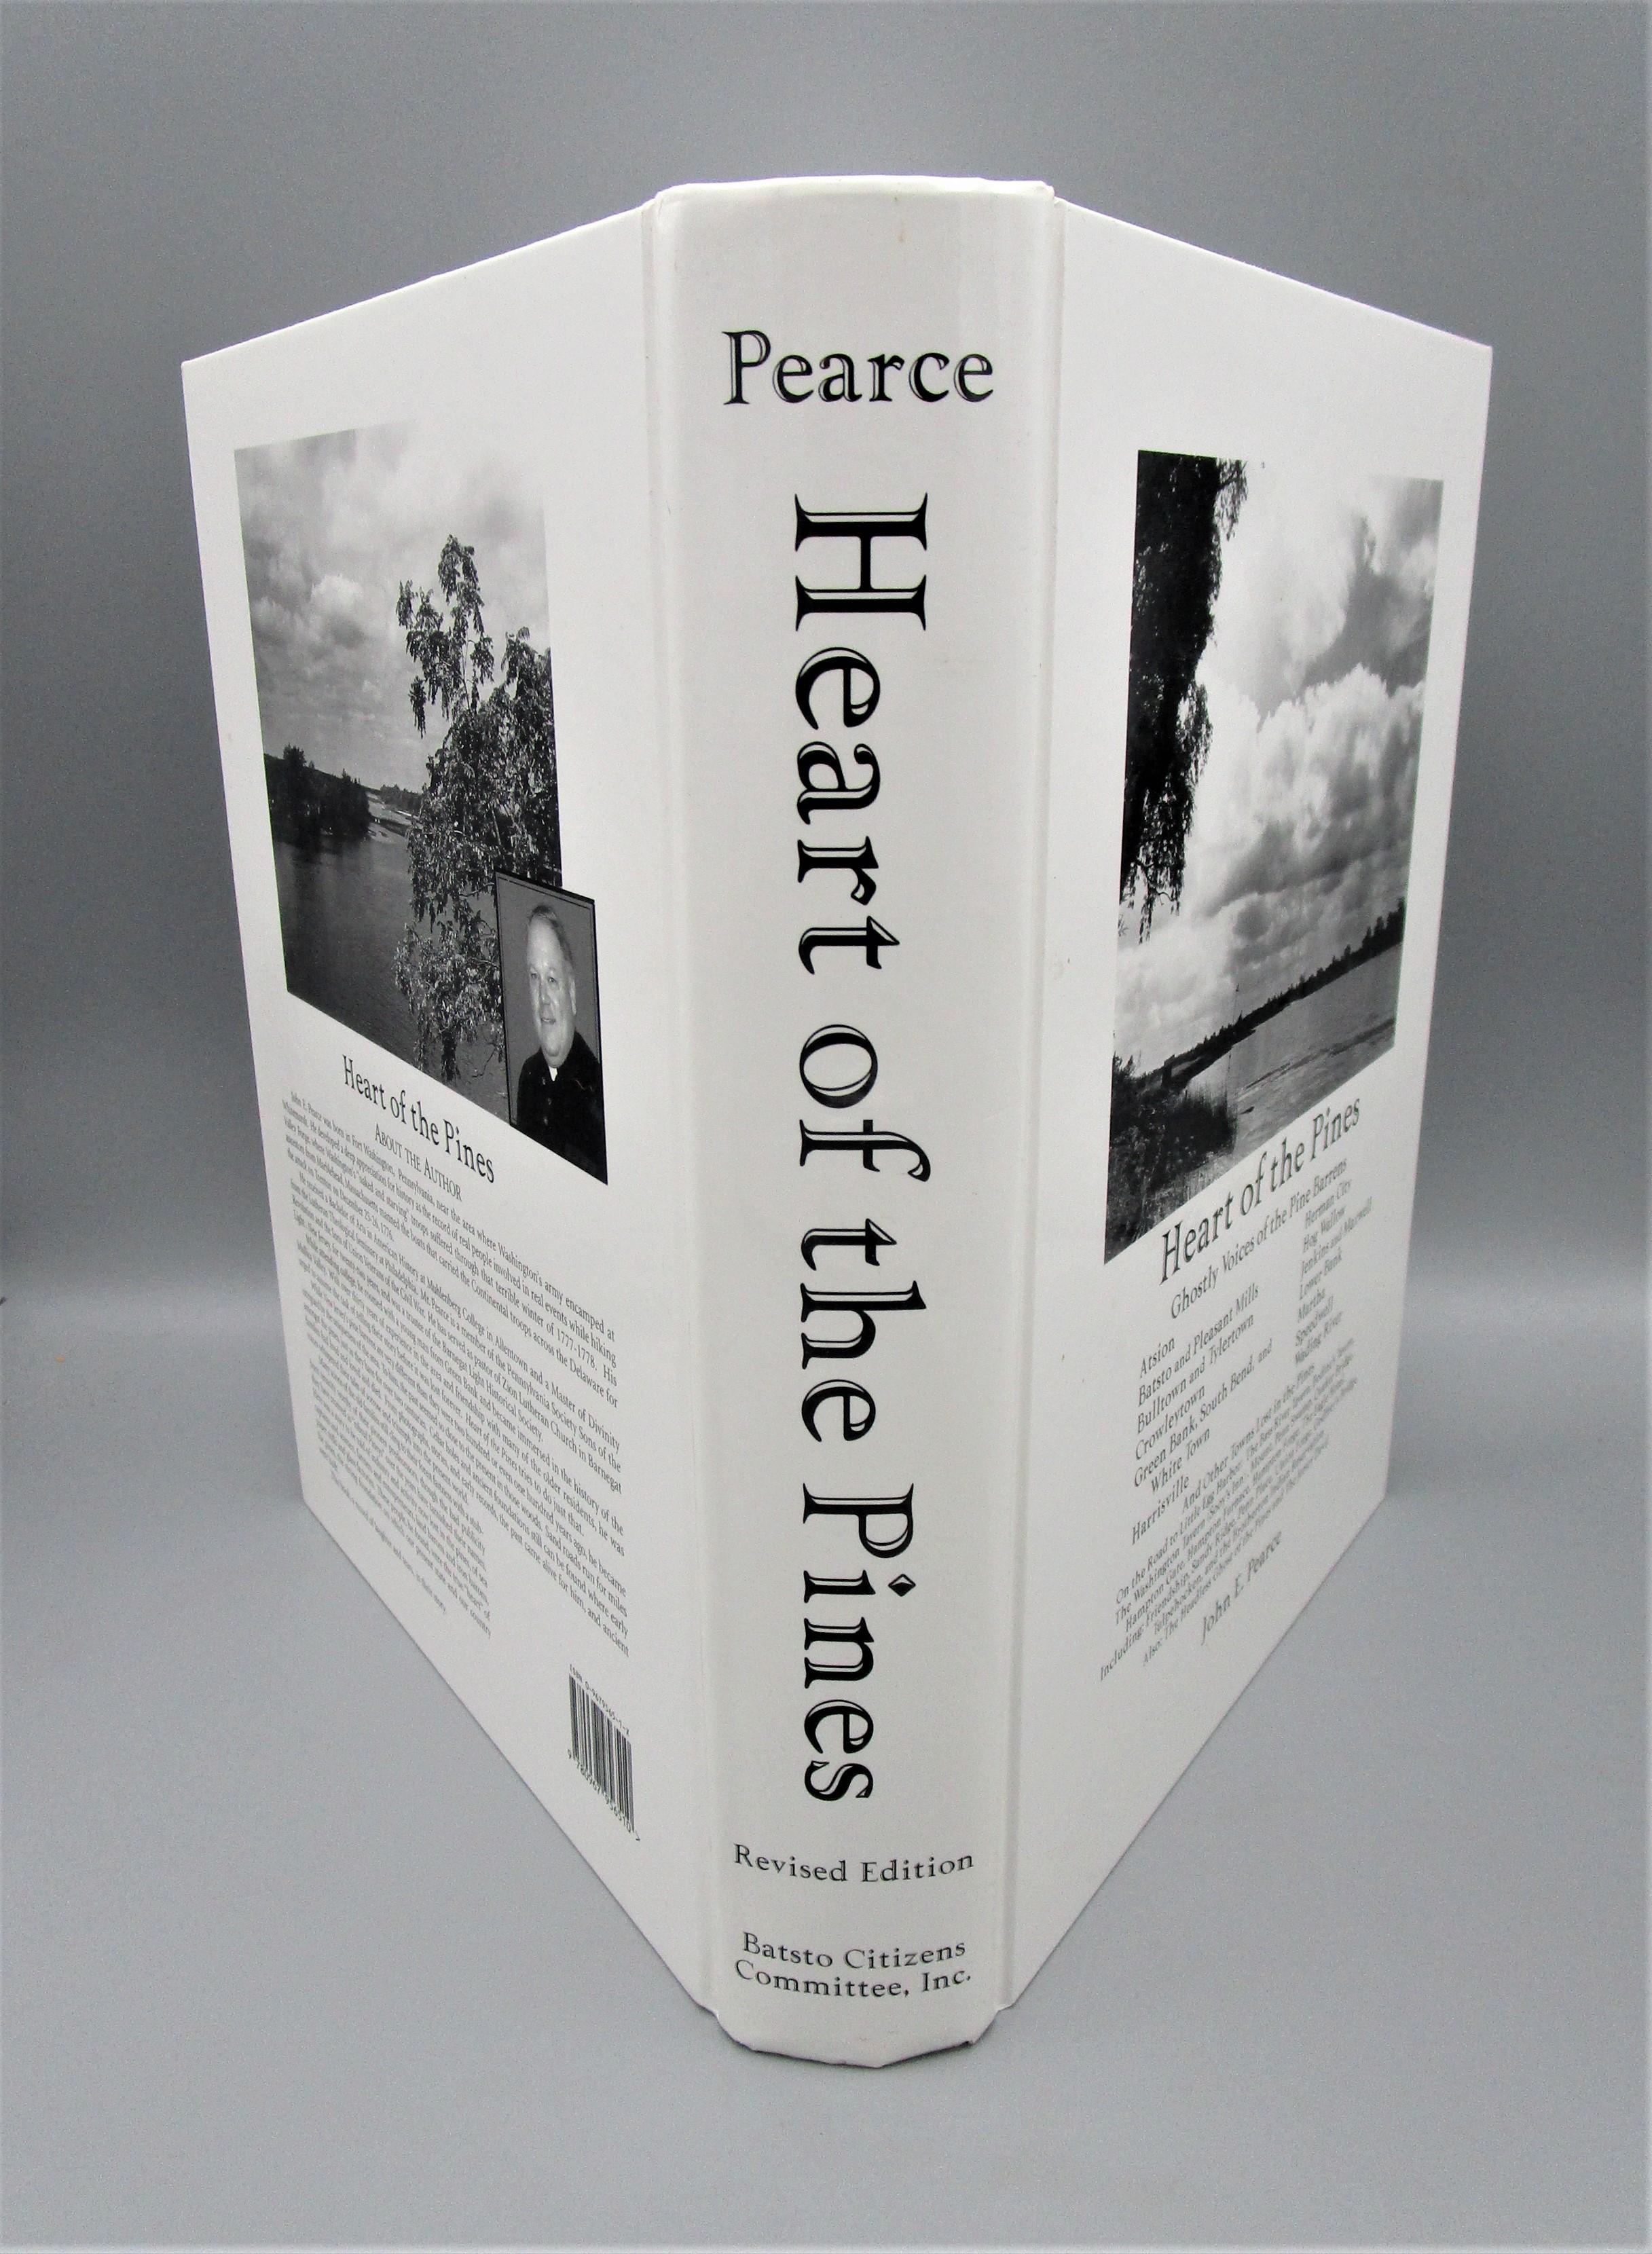 HEART OF THE PINES, by John E. Pearce - 2000